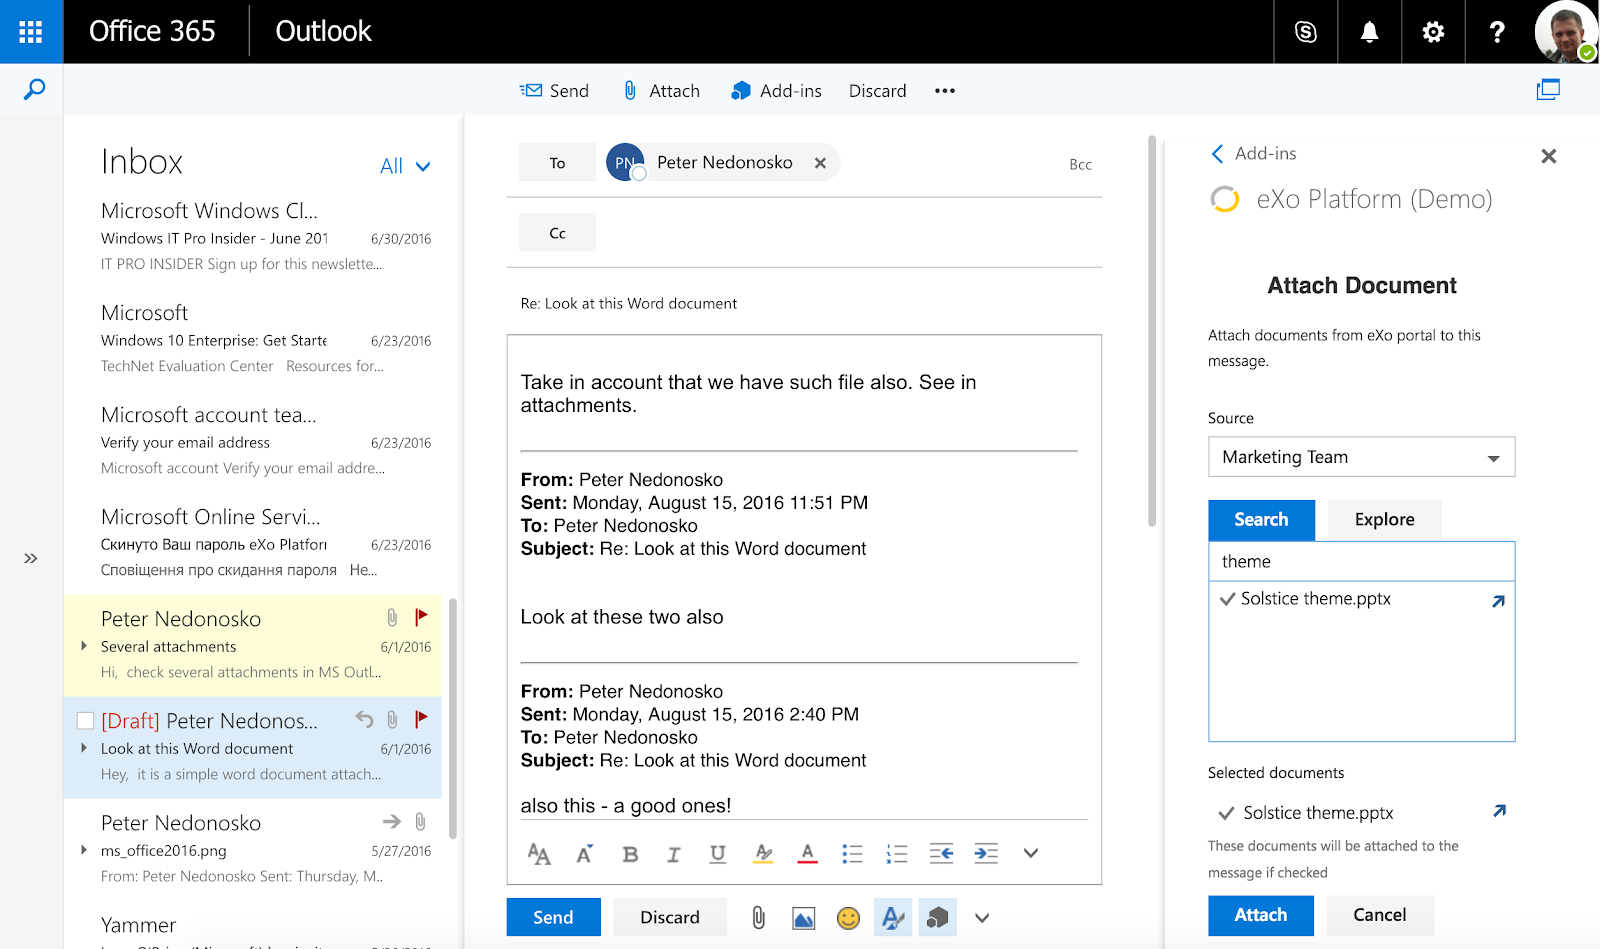 eXo : Outlook integration